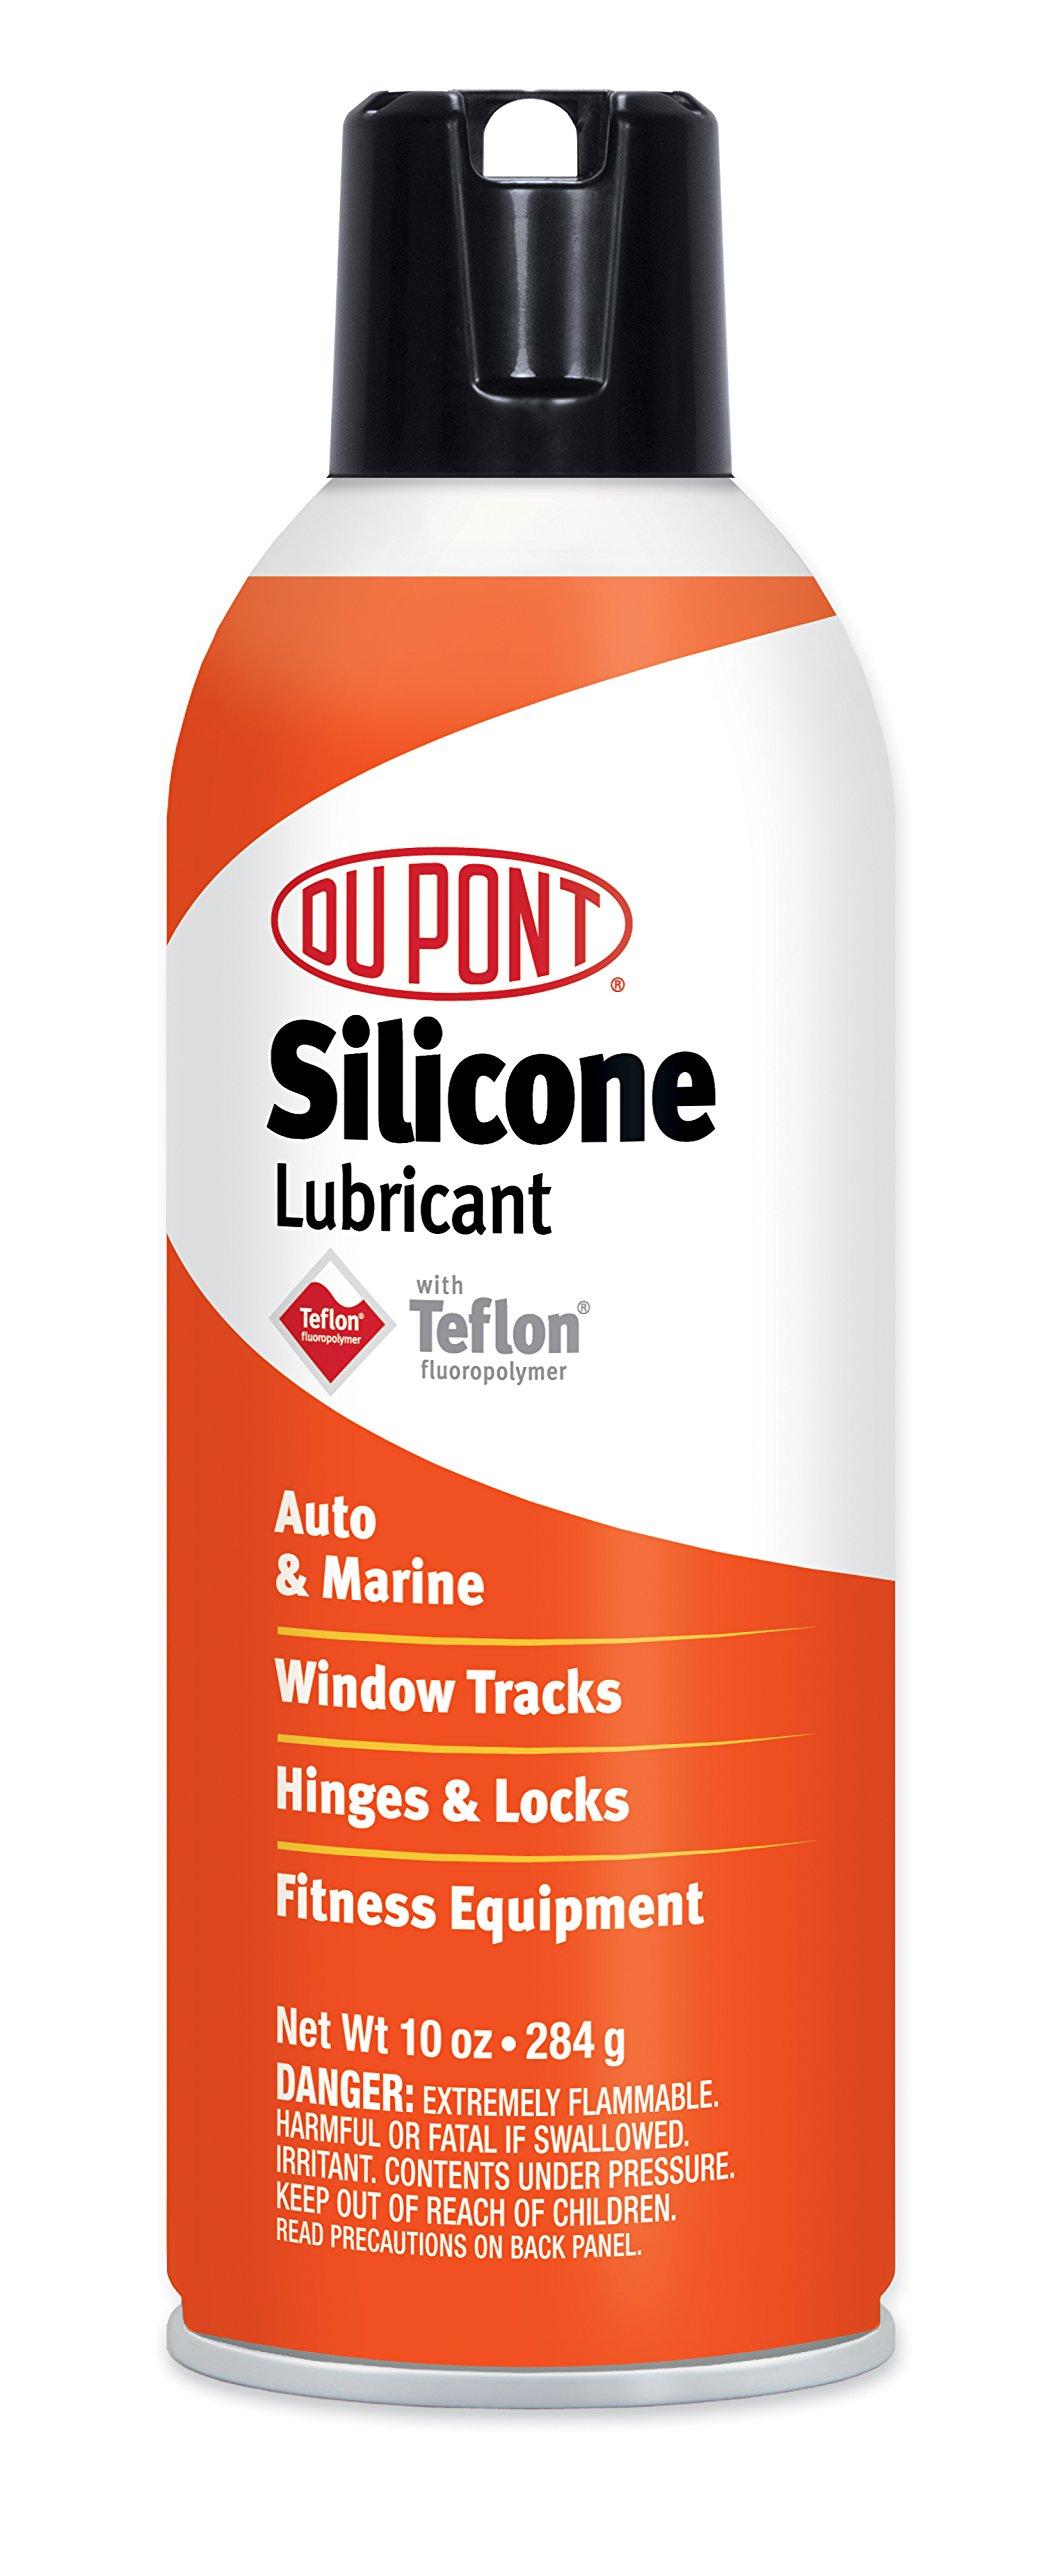 DuPont Teflon Silicone Lubricant Aerosol Spray, 14 oz